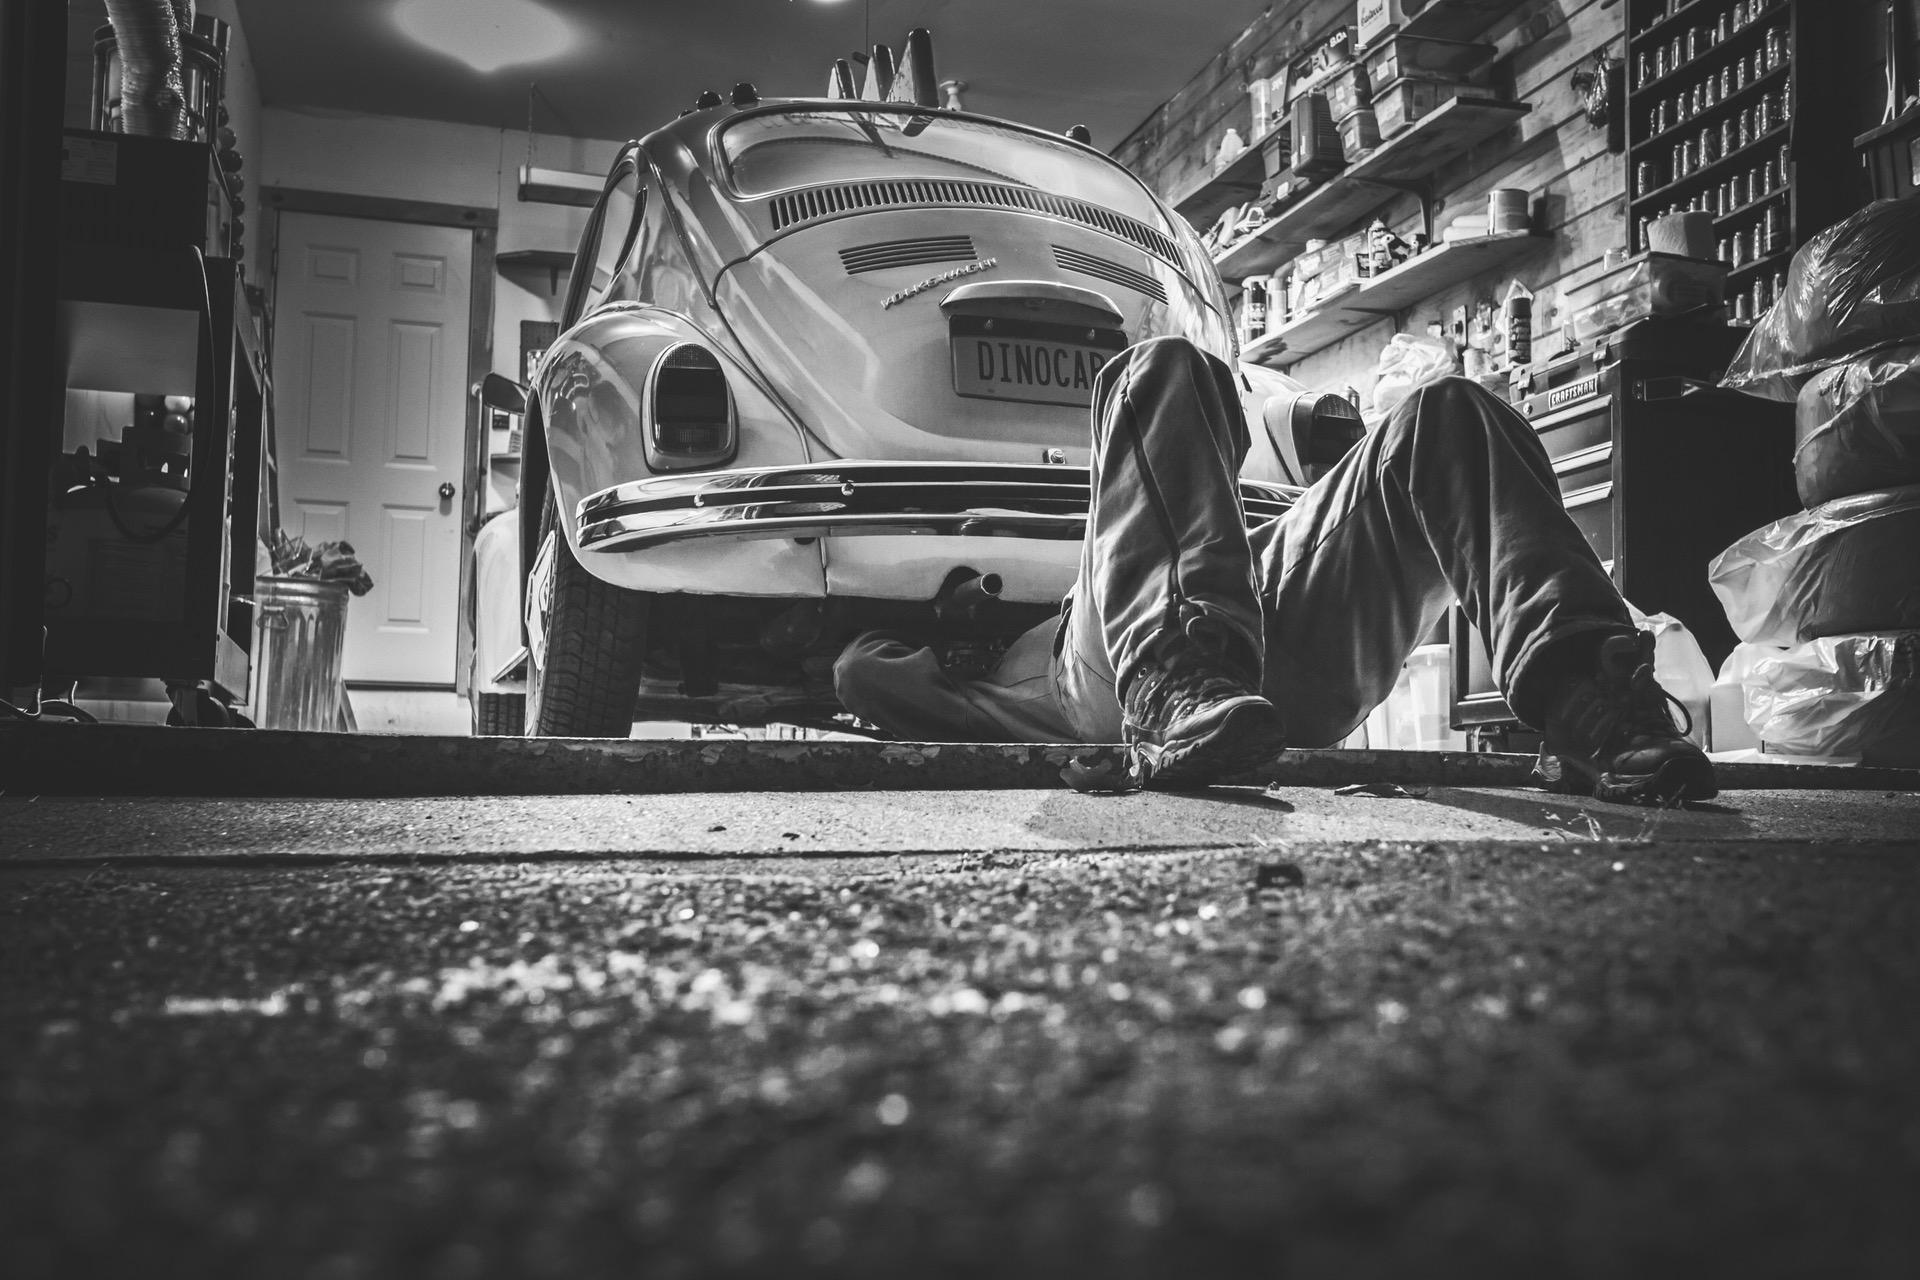 Black and white car vehicle vintage